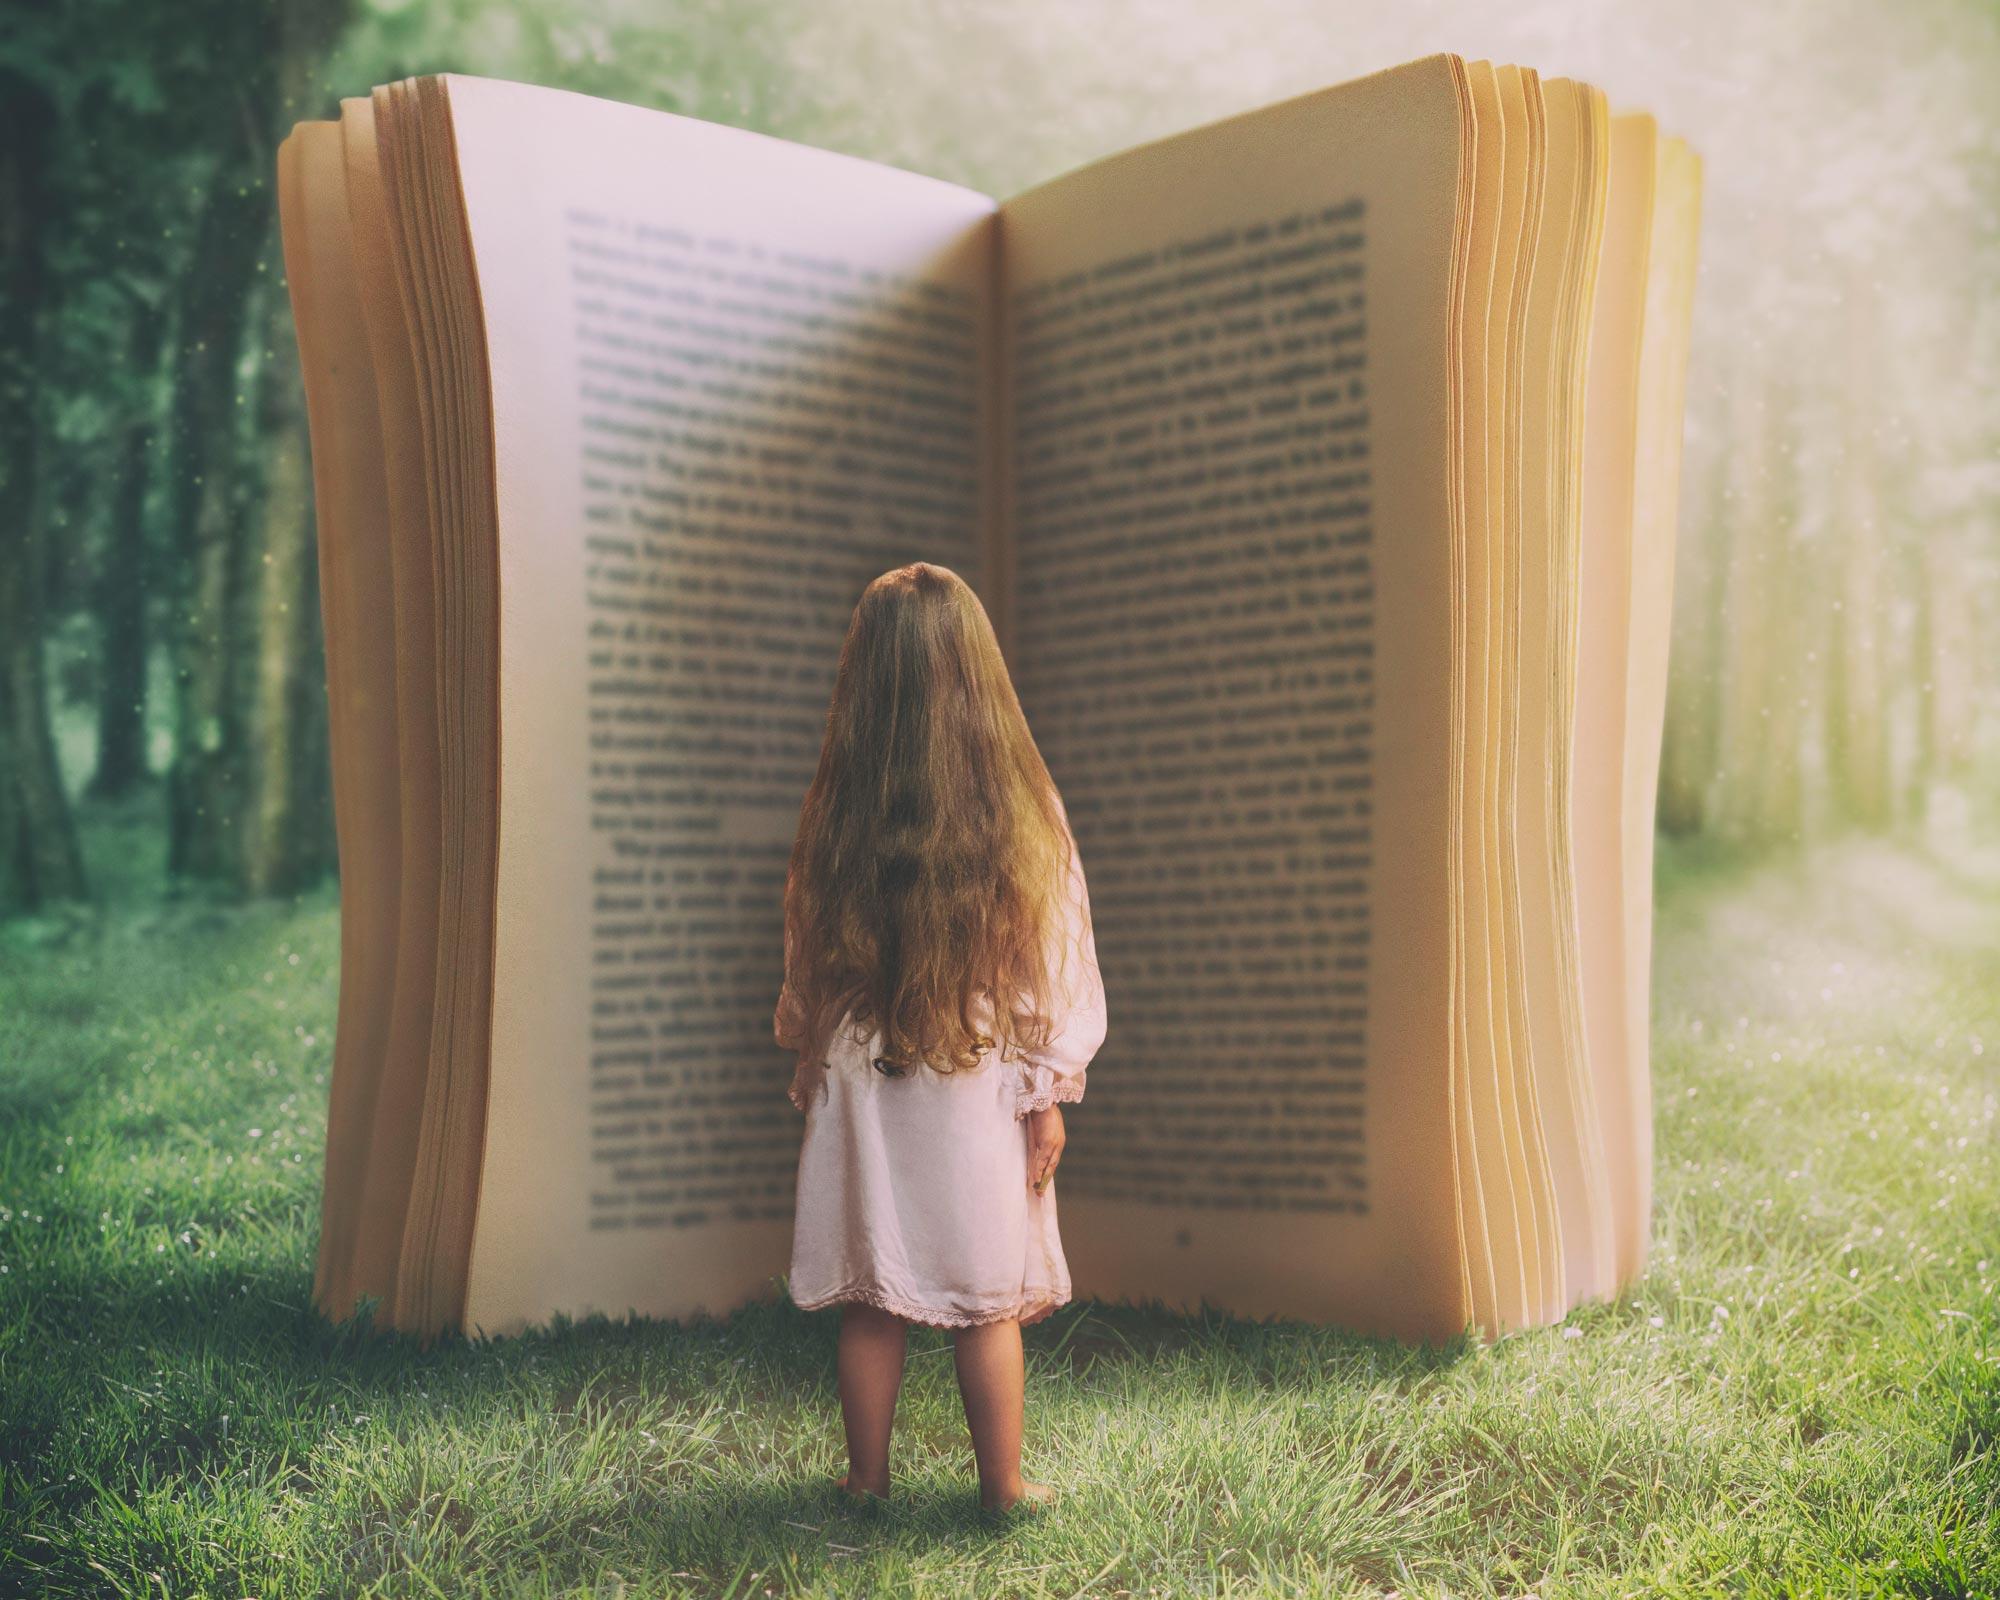 Reading Comprehension Best Practices